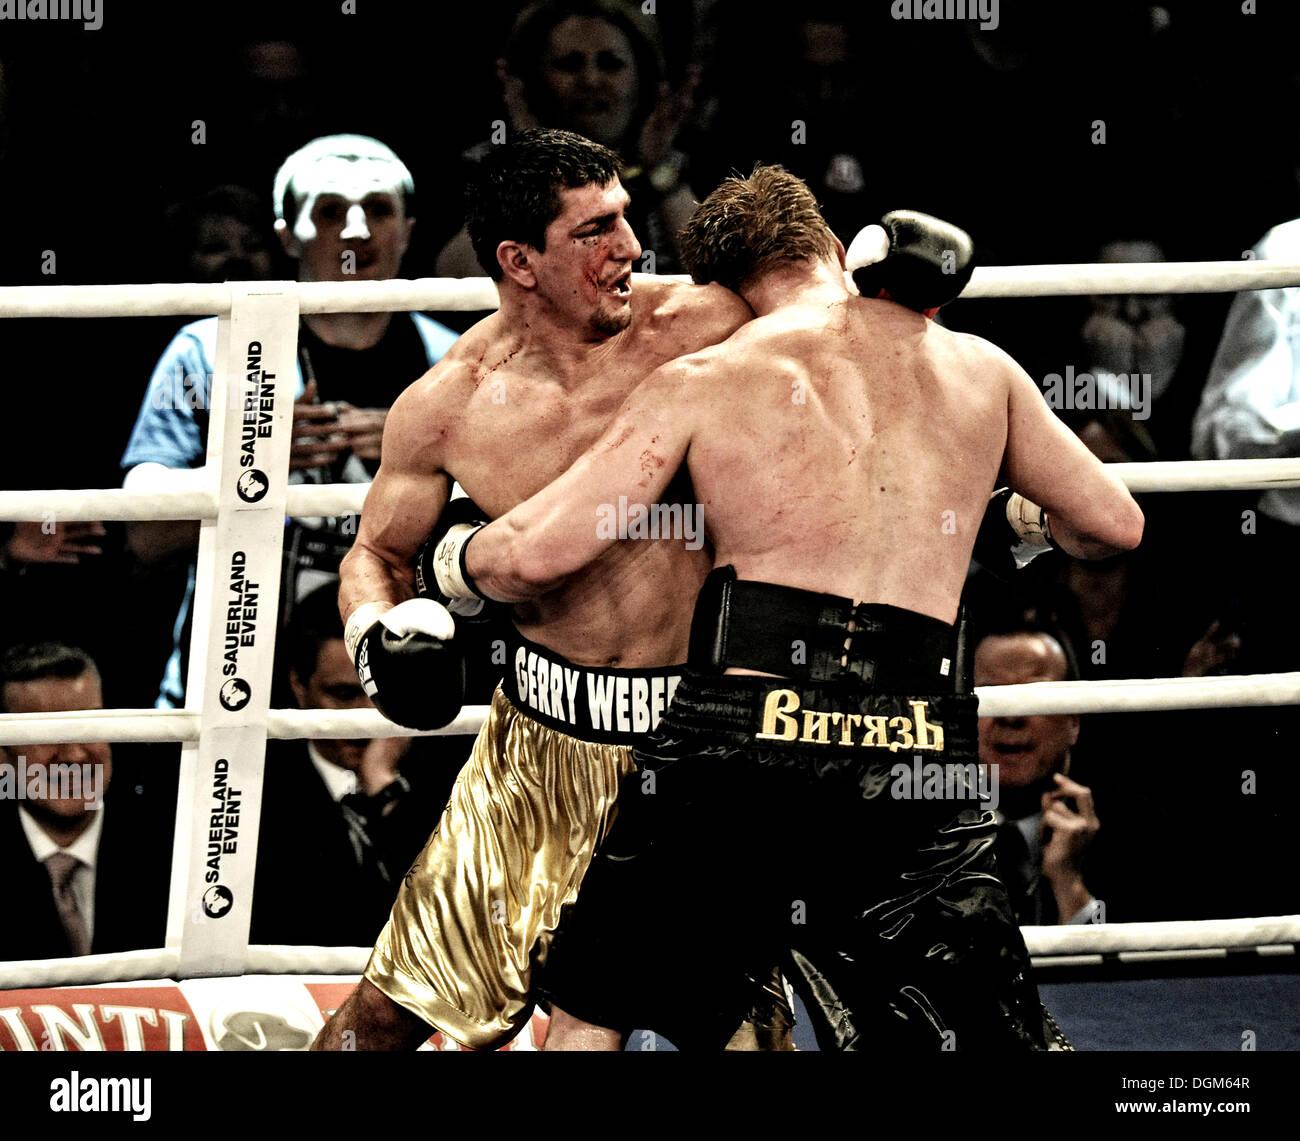 Boxing evening, heavyweight, The Battle of Stuttgart, Marco Huck, GER, vs. Alexander Vladimirovich Povetkin, RUS, Porsche Arena - Stock Image